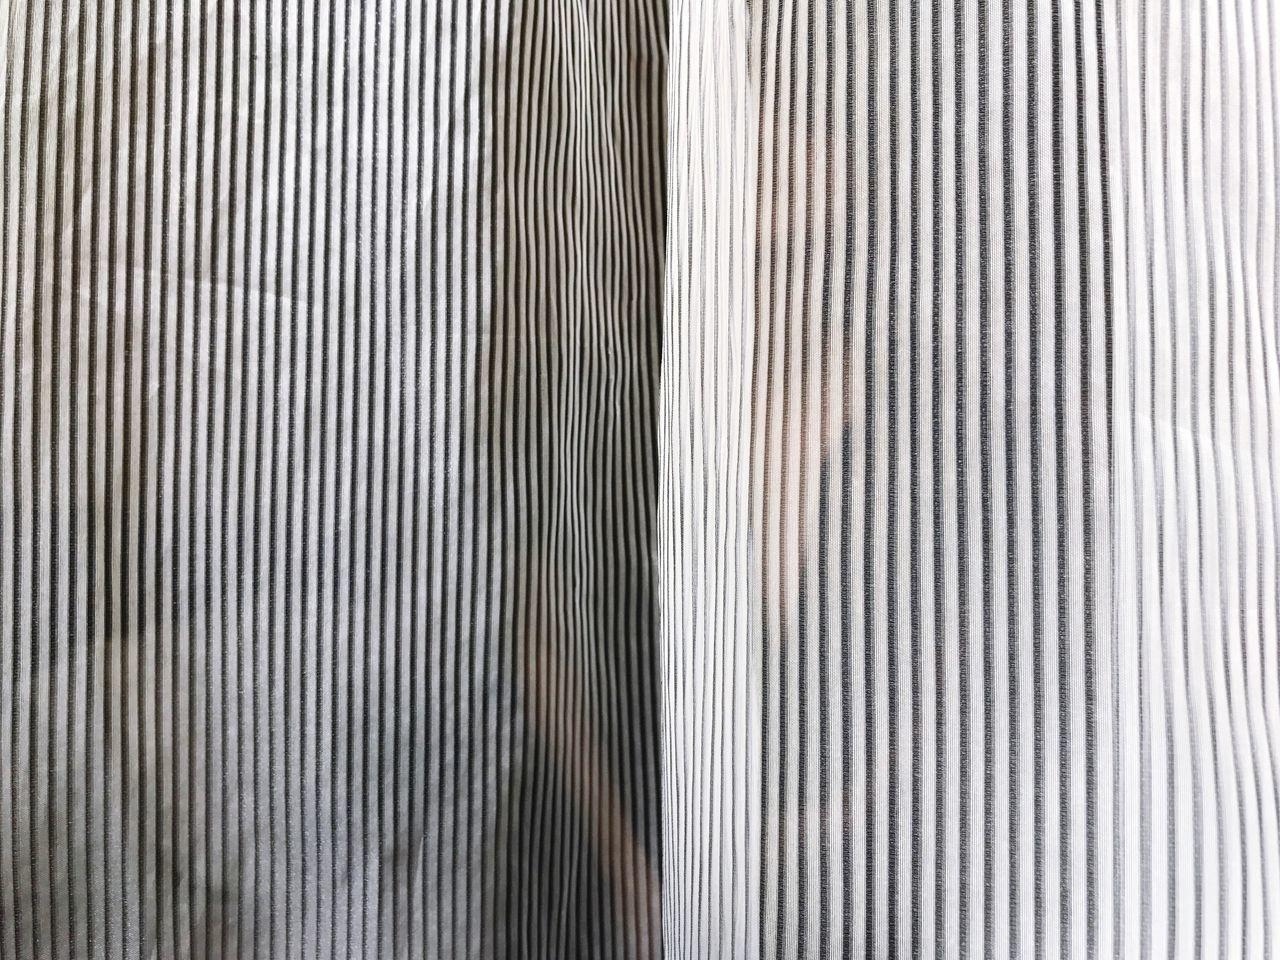 Curtain Call - a Self Portrait test.